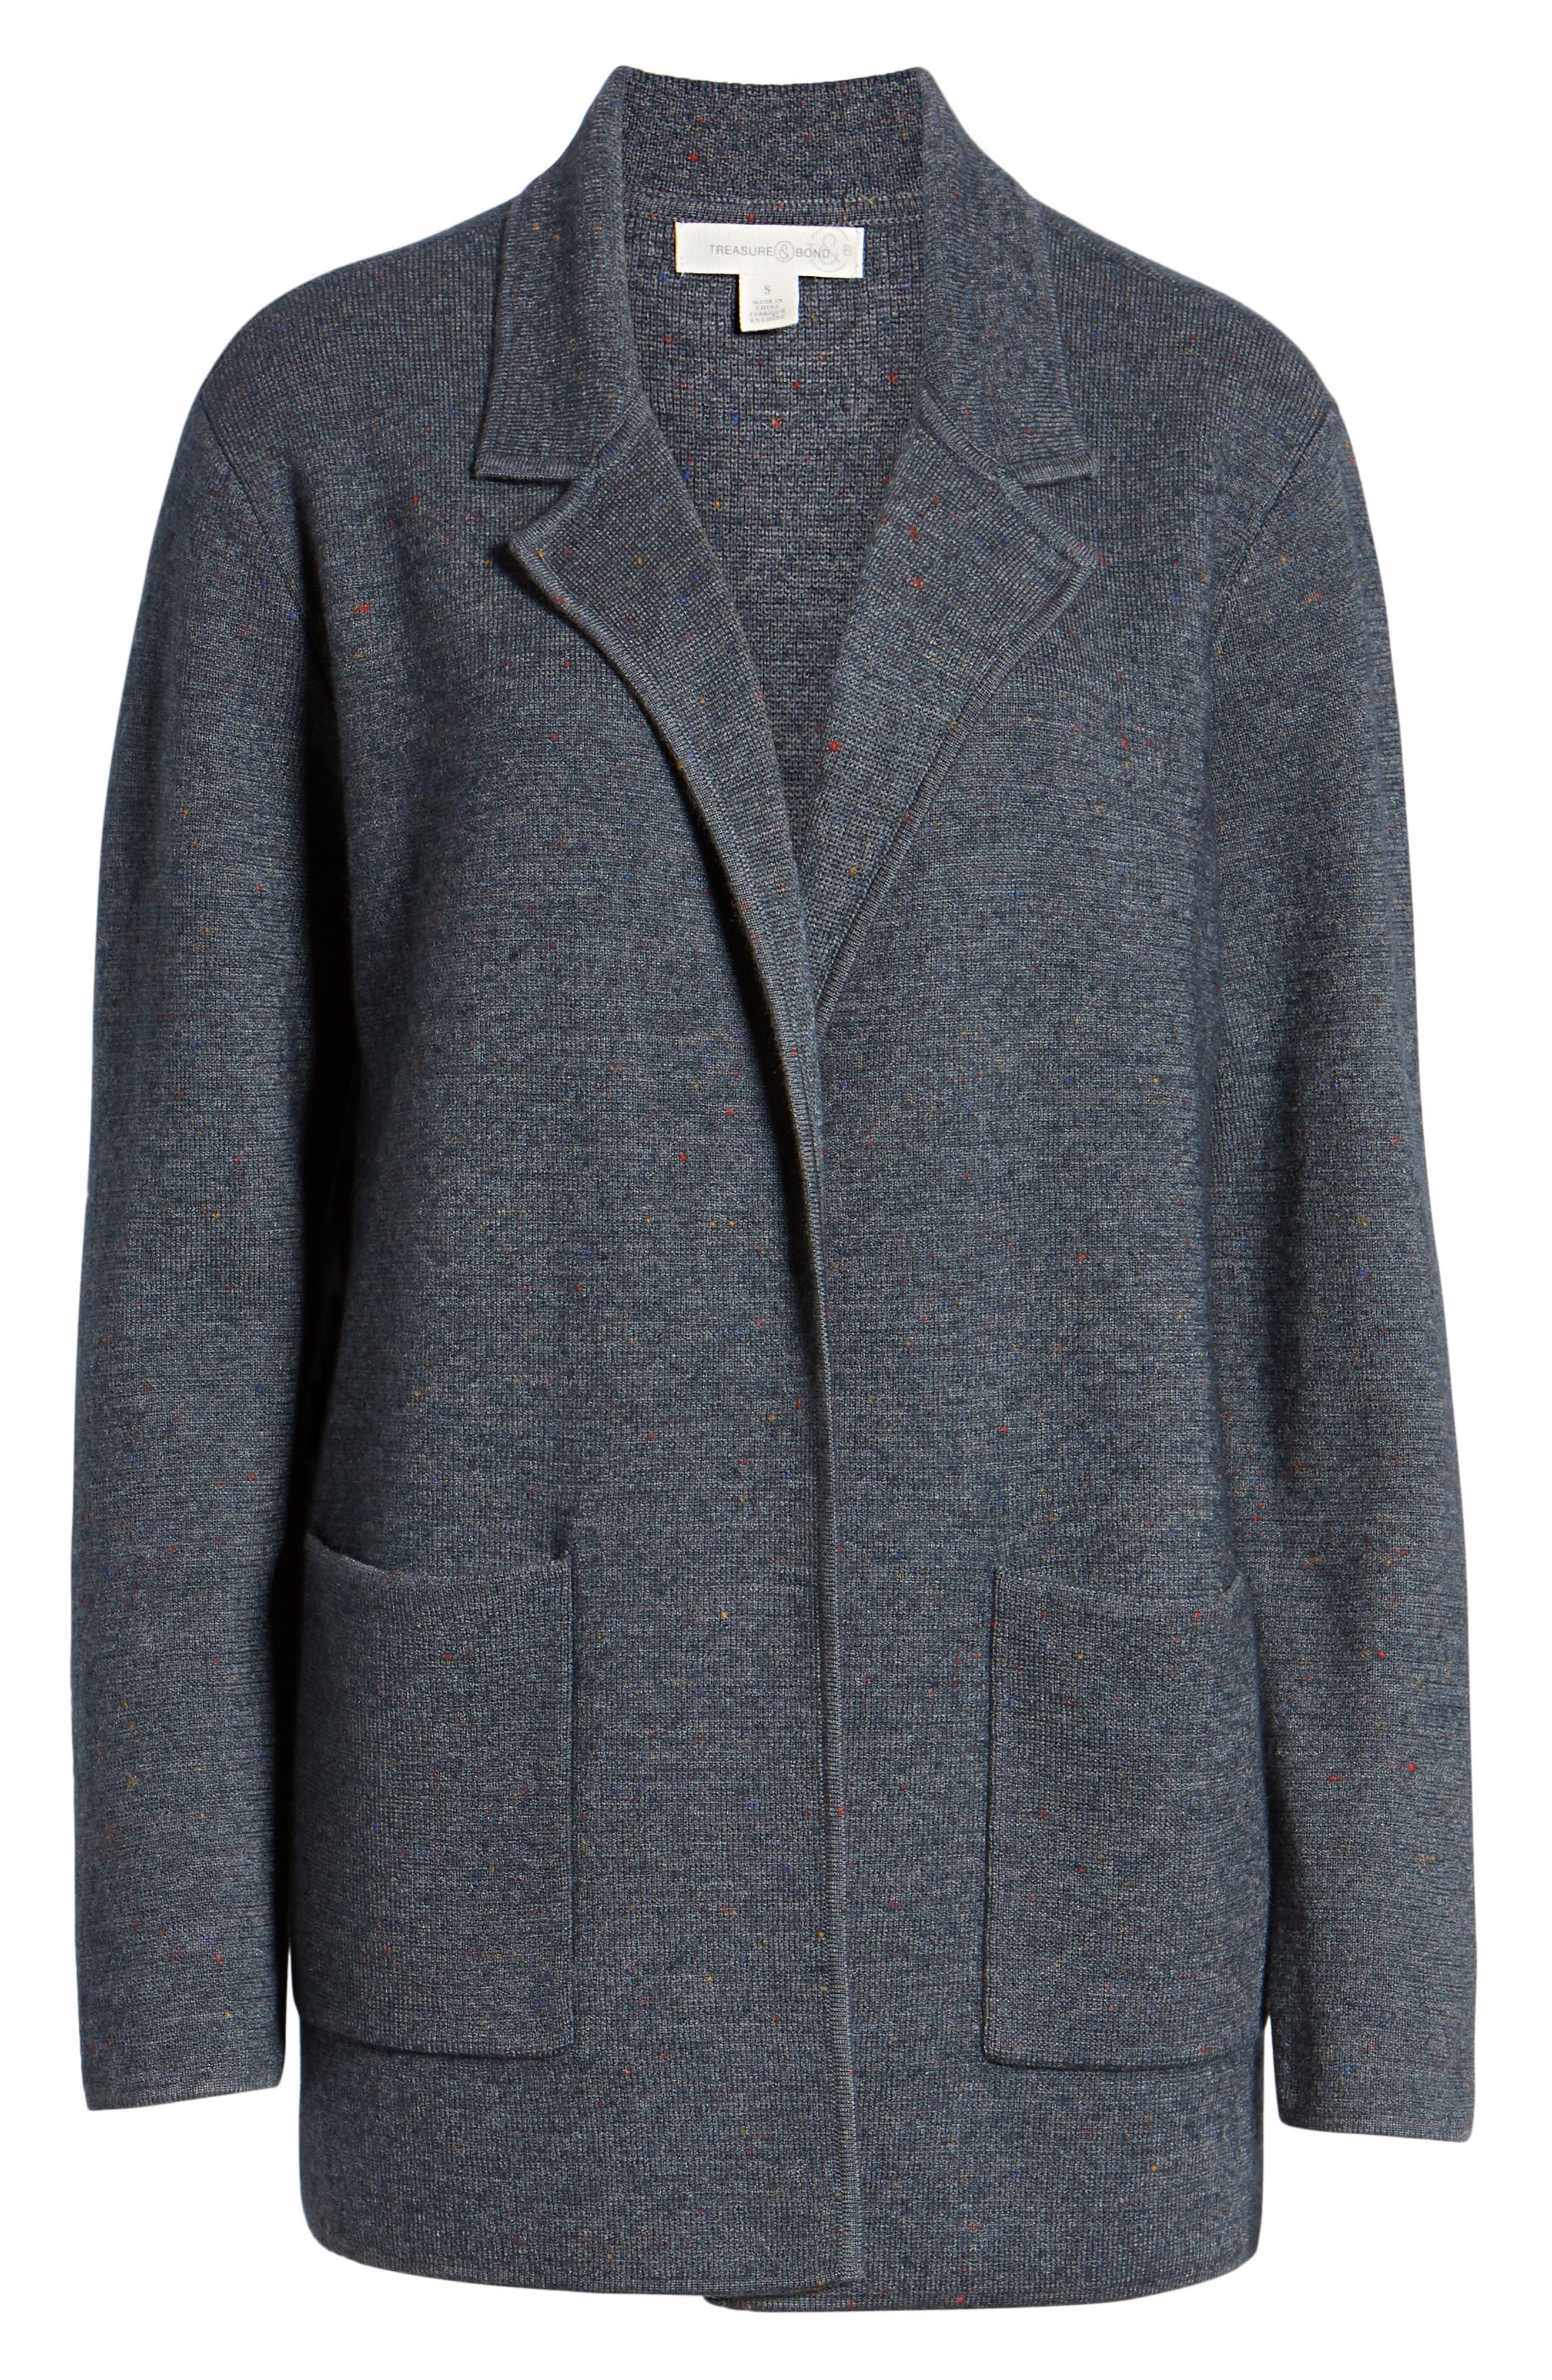 Sweater Blazer,                             Alternate thumbnail 6, color,                             GREY MEDIUM CHARCOAL HEATHER